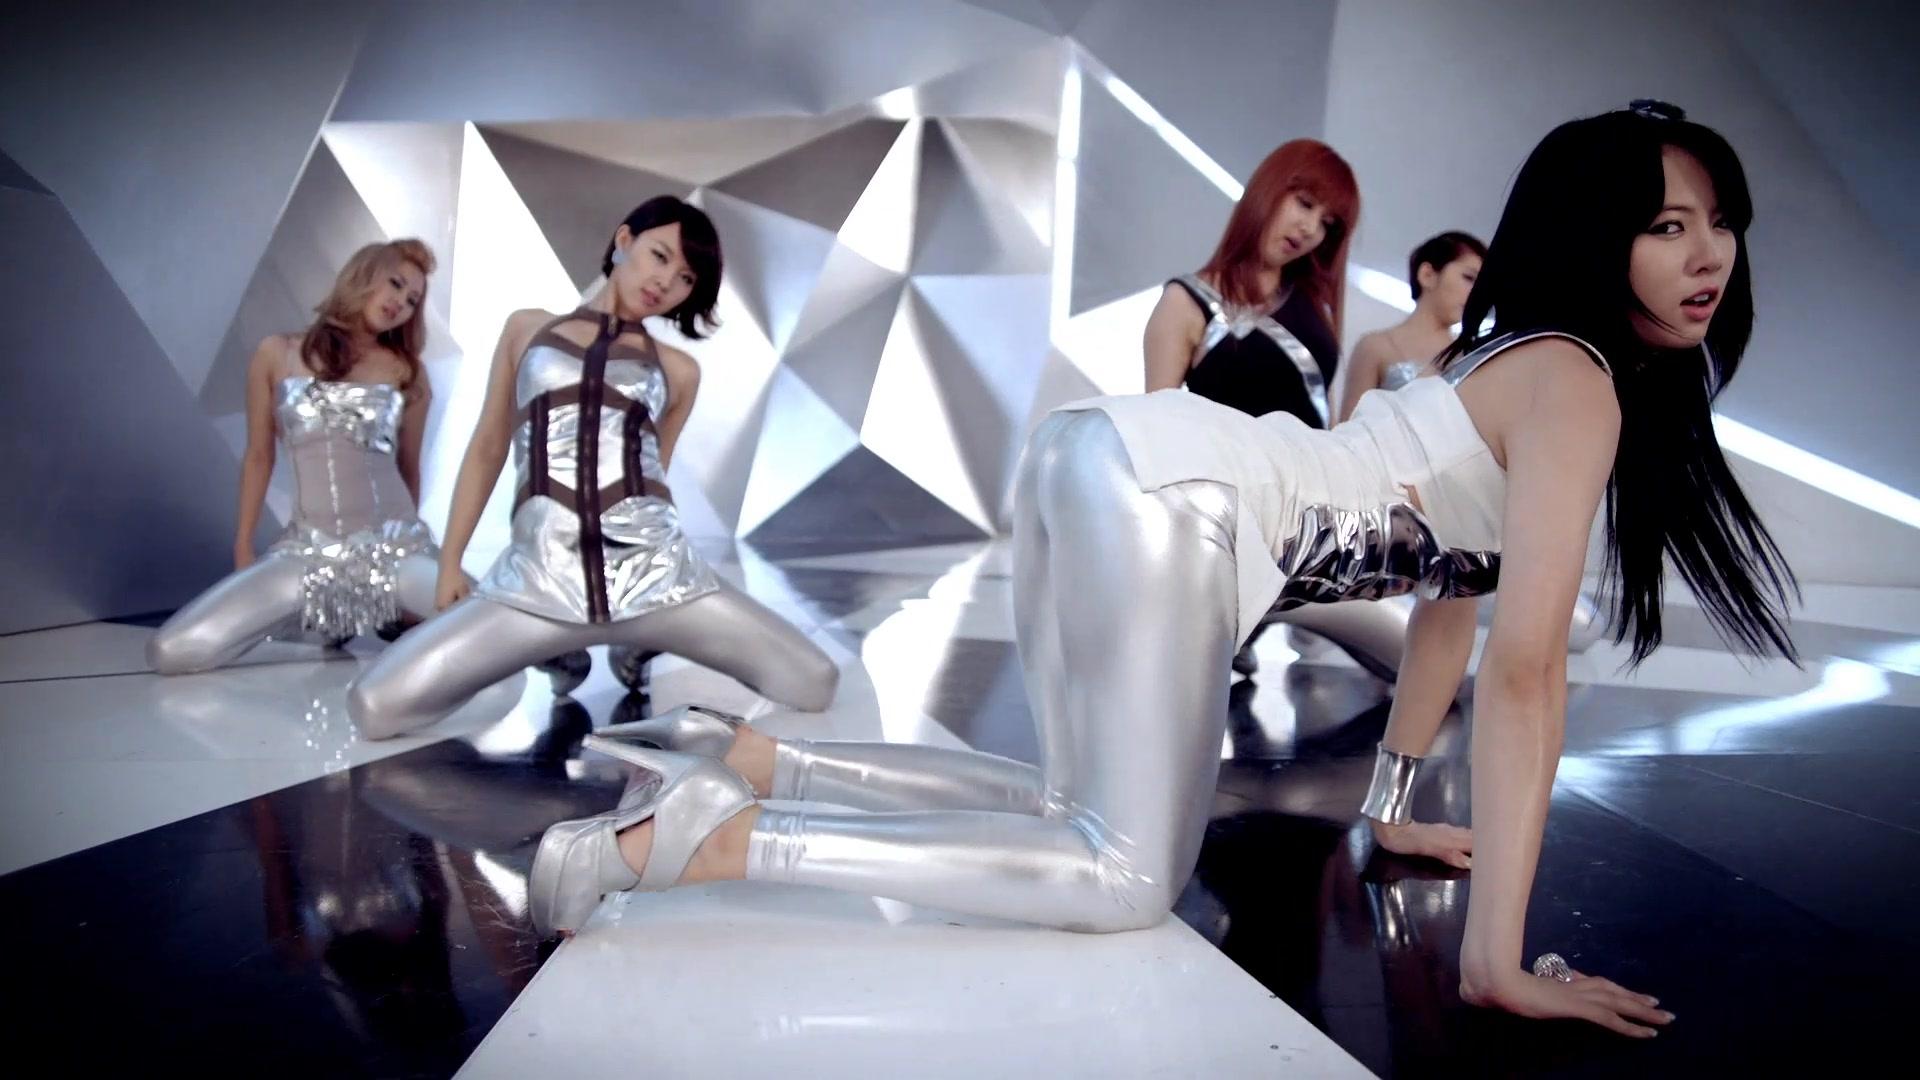 K-POPアイドルのエロい振り付け・ダンス動画 5 [無断転載禁止]©bbspink.comYouTube動画>596本 ->画像>297枚